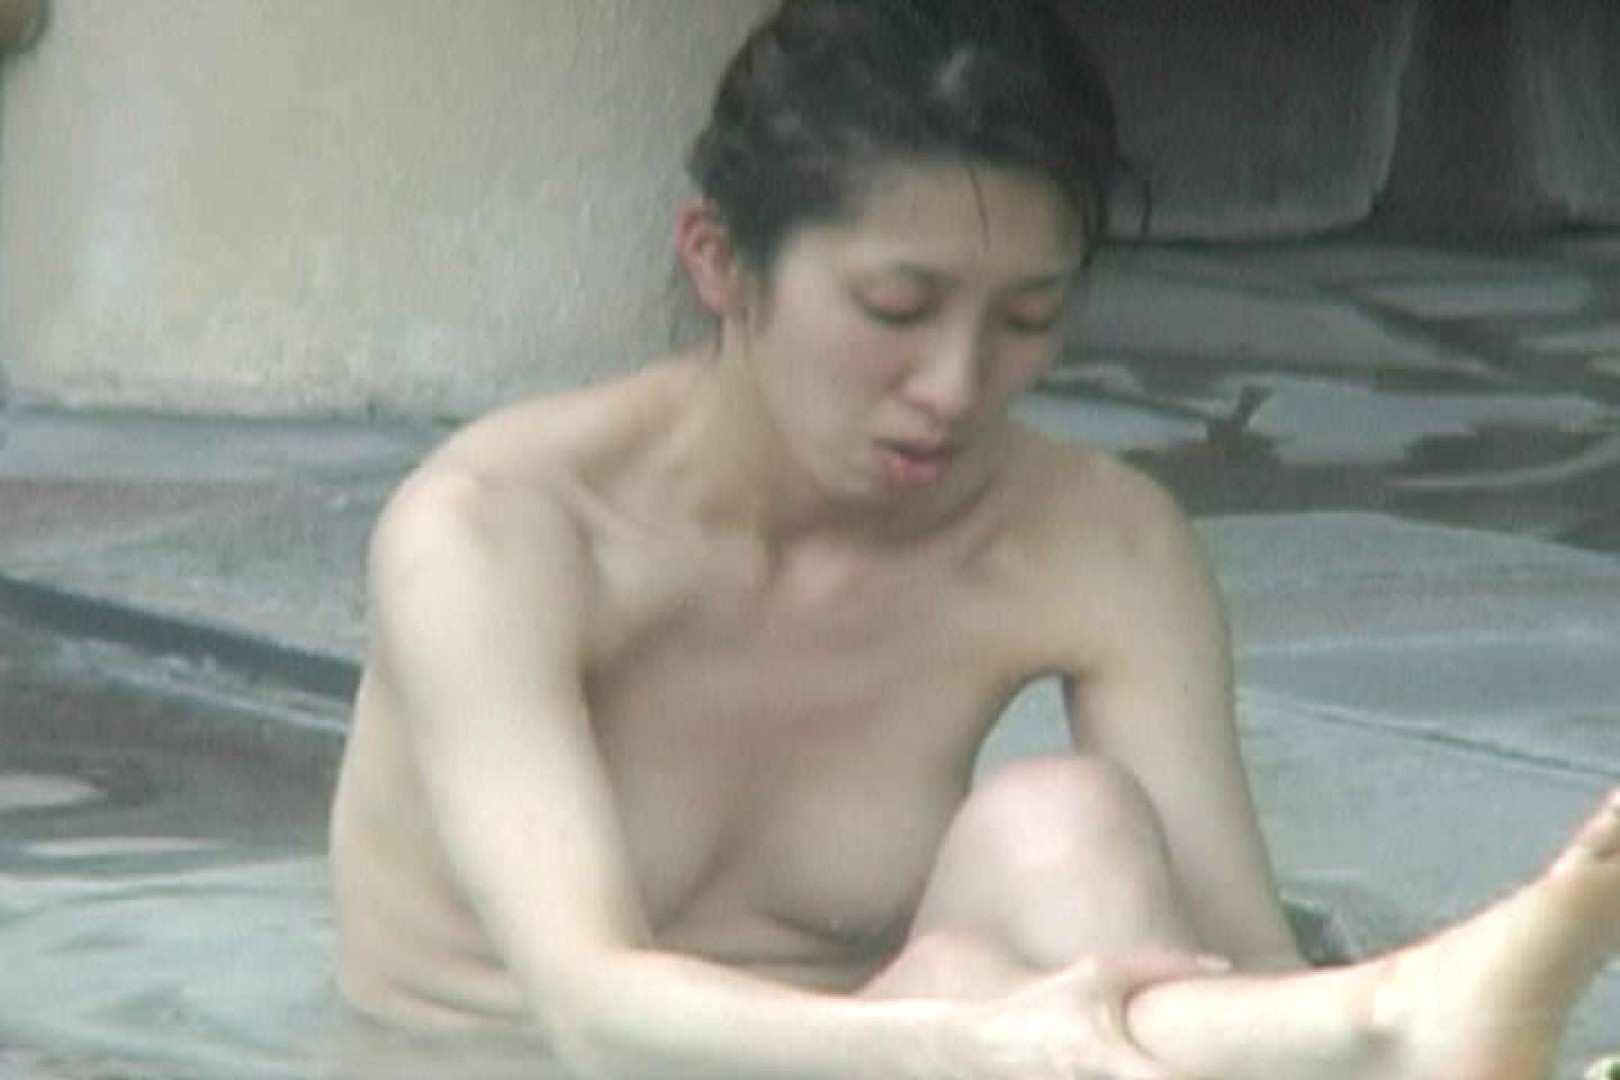 Aquaな露天風呂Vol.588 0  41連発 5